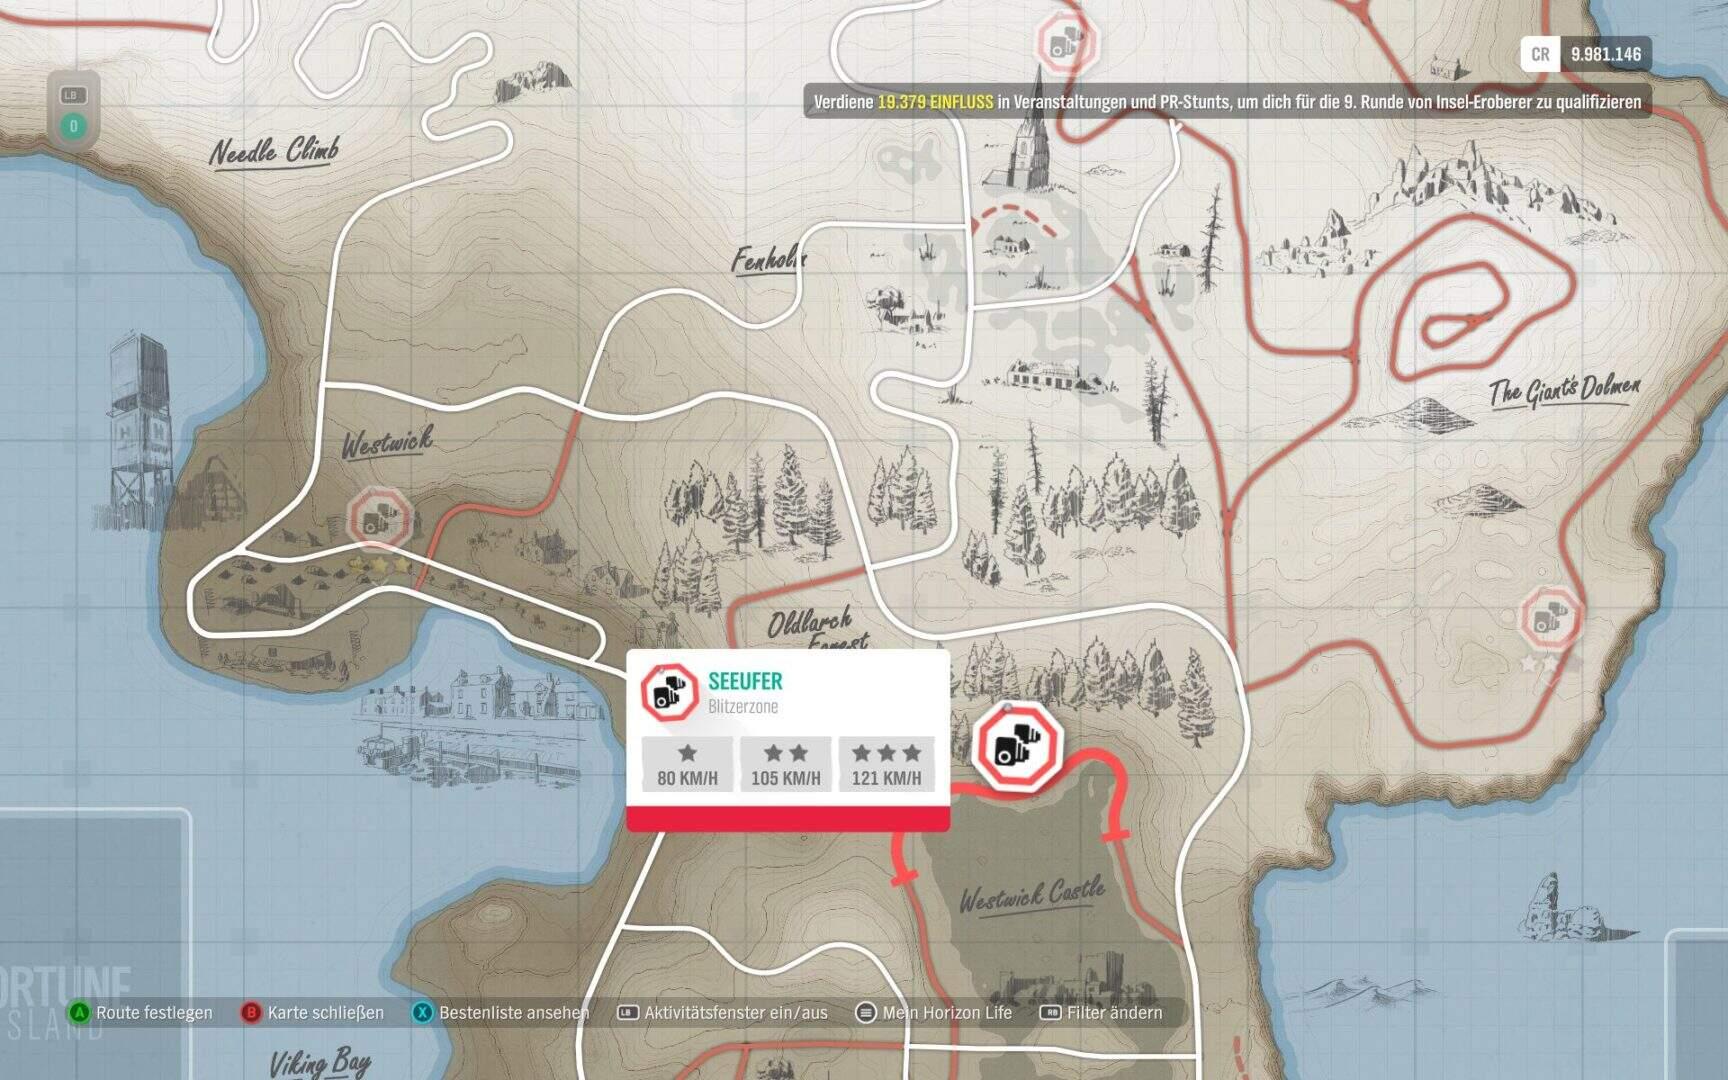 Forza Horizon 4 Fortune Island Seeufer Blitzerzone